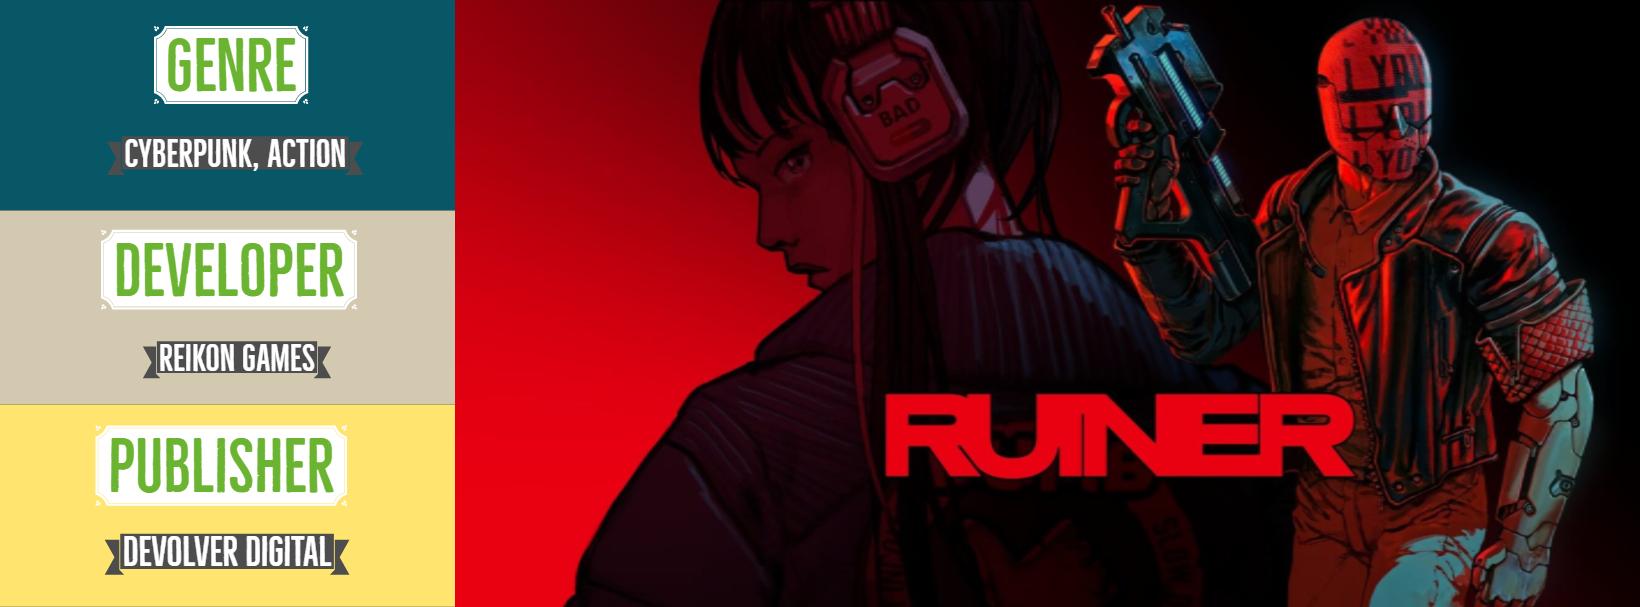 ruiner-banner-image